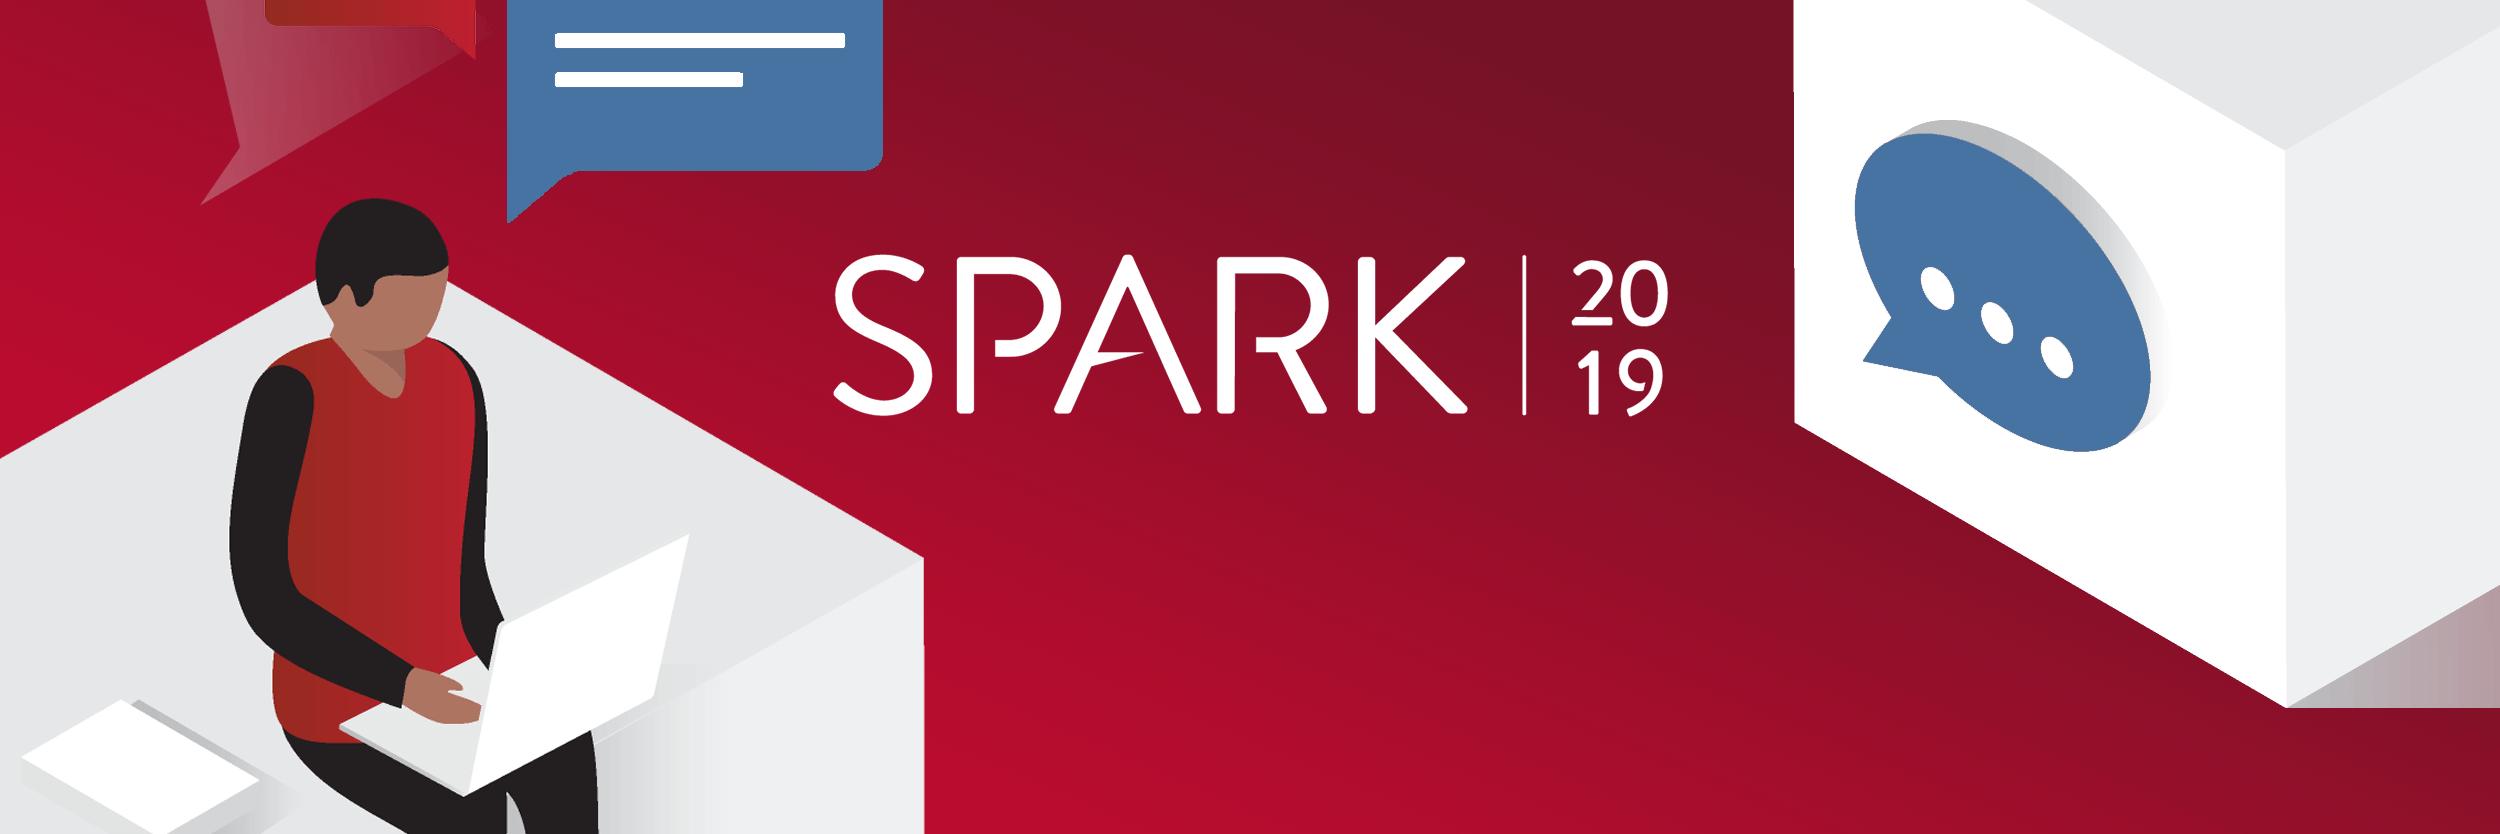 Ian Brooks - Maven Insights - SPARK 2019 by Sideways 6